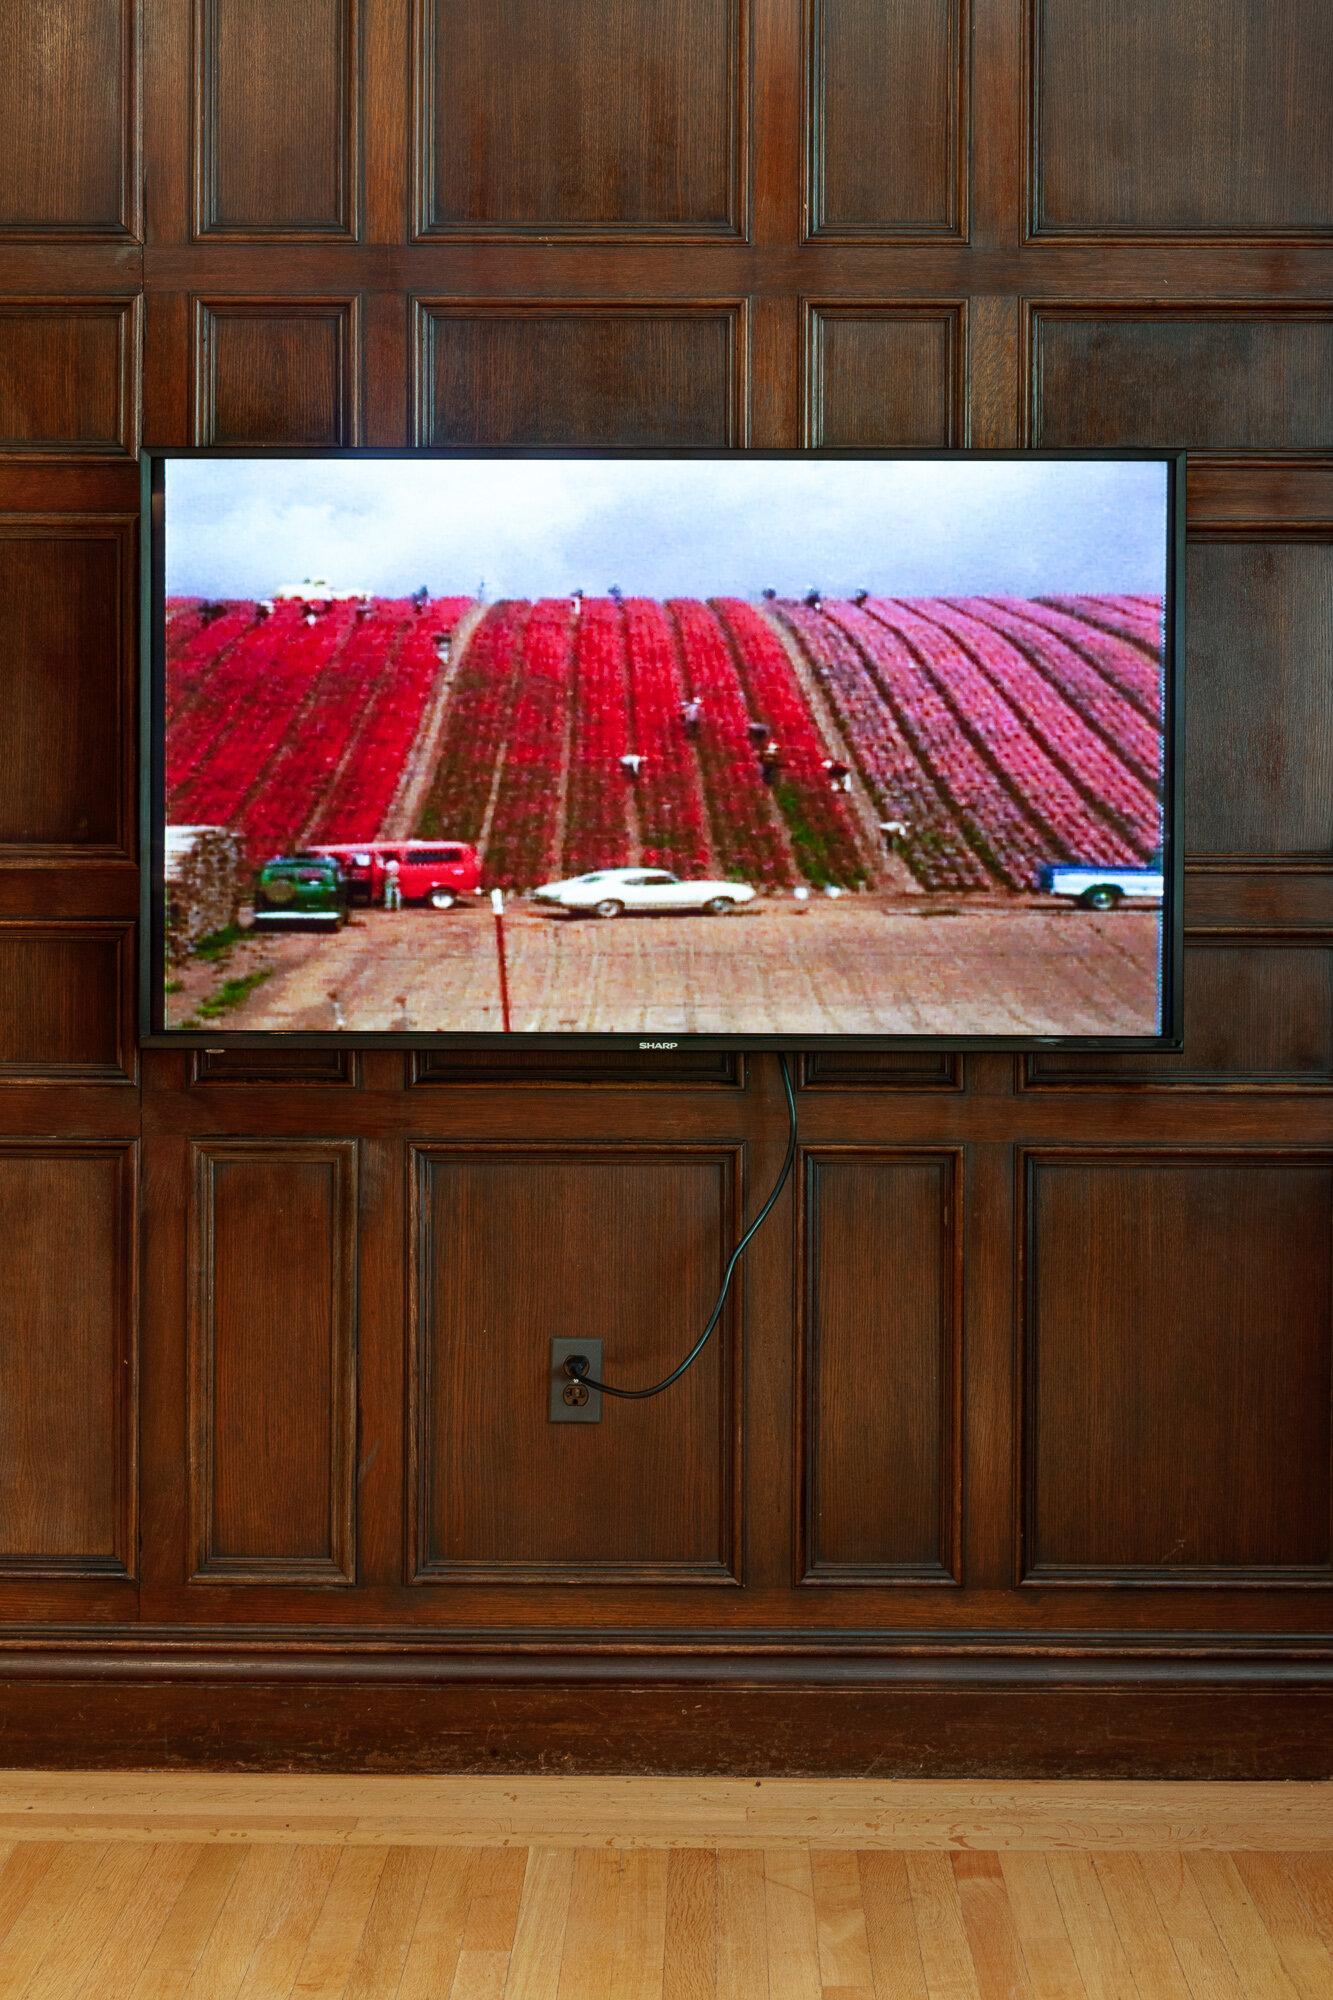 Installation view:  Martha Rosler: Passionate Signals , Neubauer Collegium for Culture and Society, University of Chicago, September 17, 2019 - January 31, 2020. Photo: Robert Heishman.